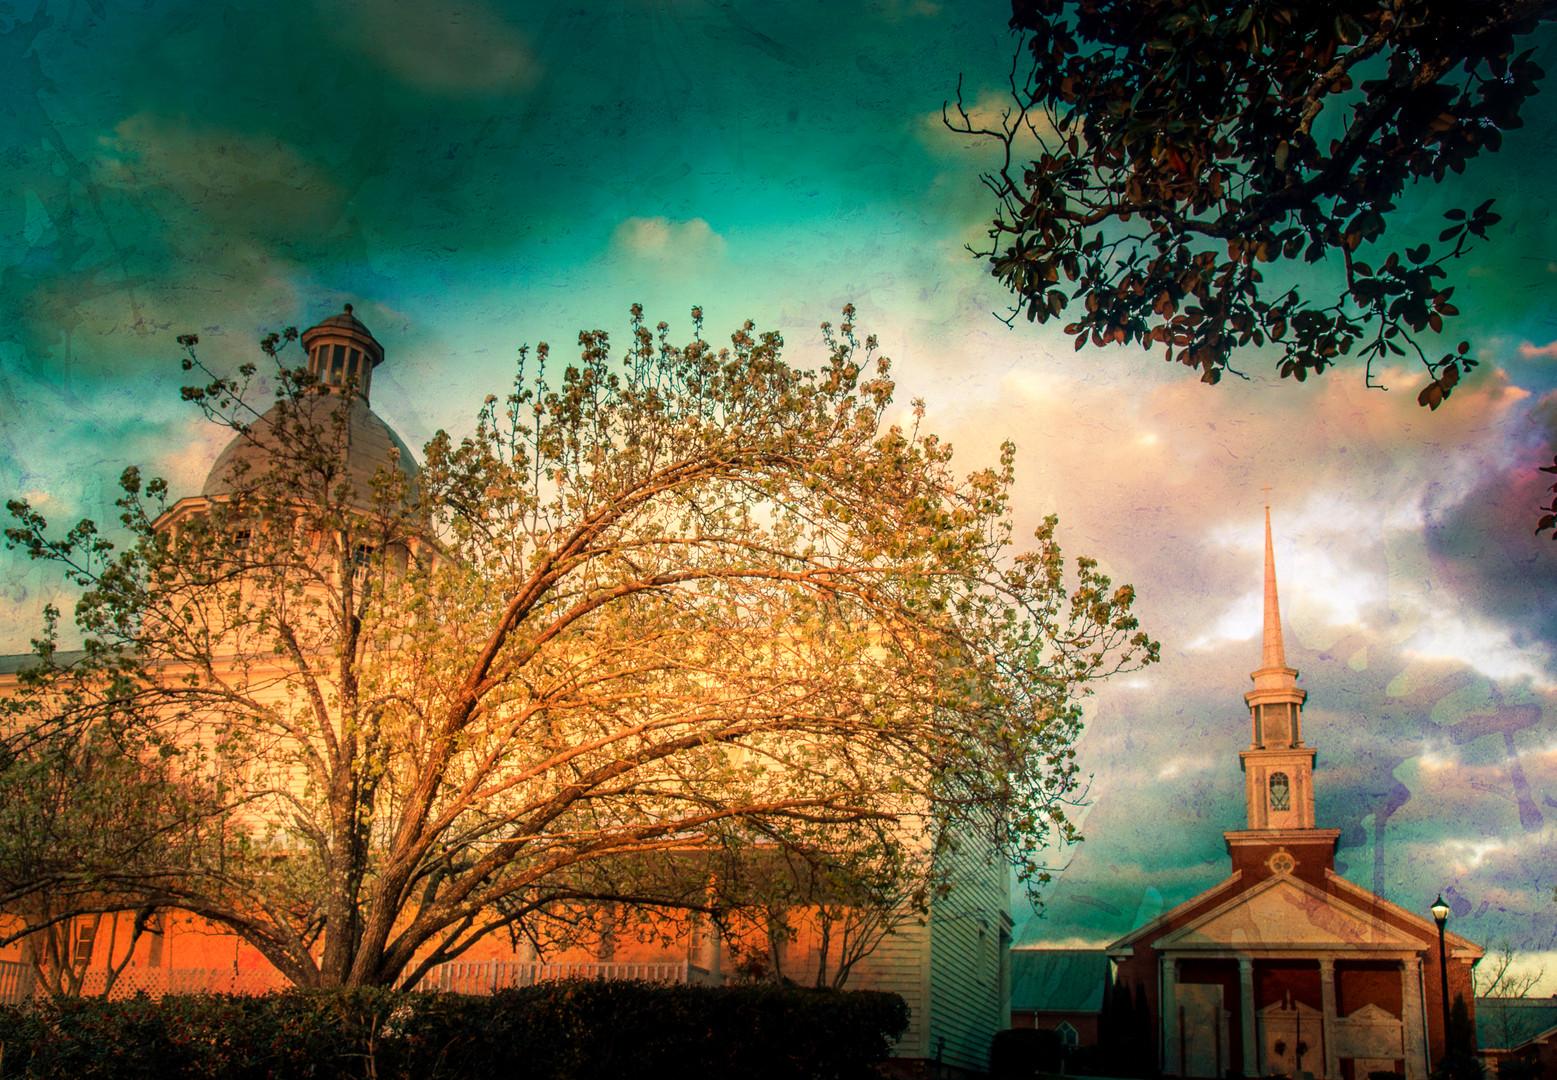 Methodist Church & Chatauqua